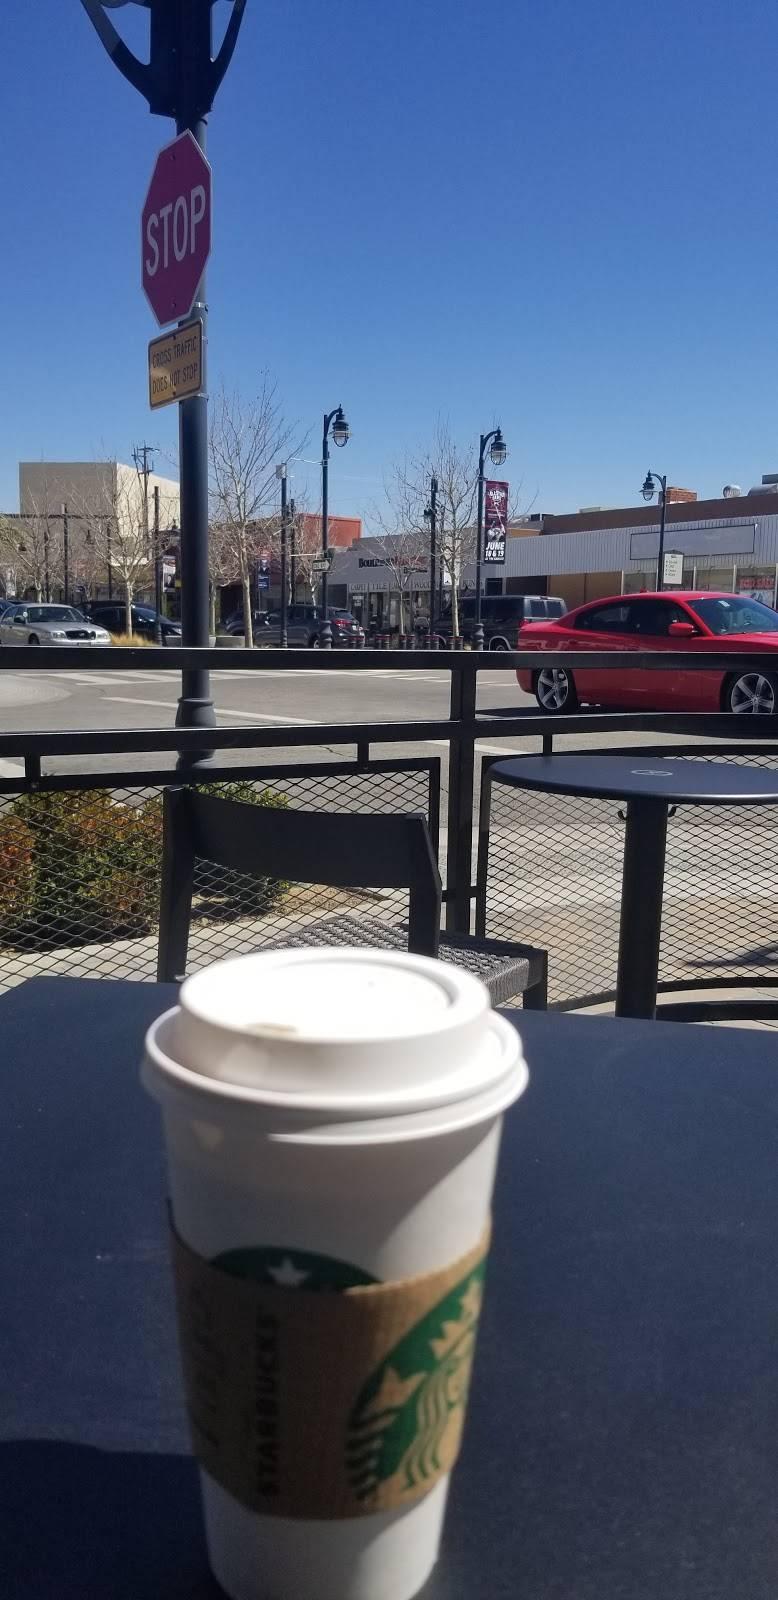 Starbucks | cafe | 843 W Lancaster Blvd, Lancaster, CA 93534, USA | 6614716409 OR +1 661-471-6409